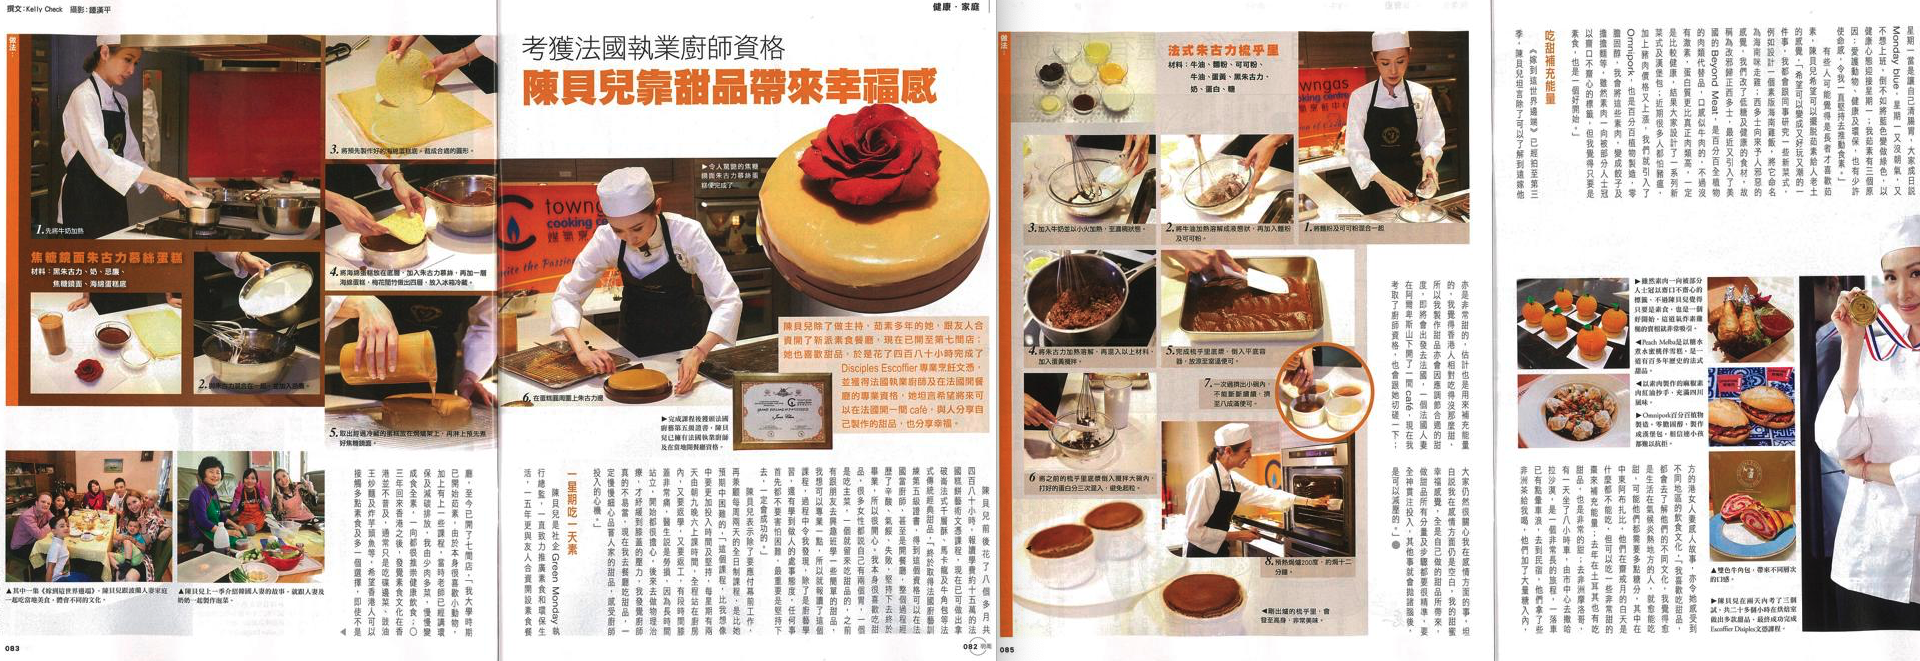 MingPao-Weekly-16.06.2019